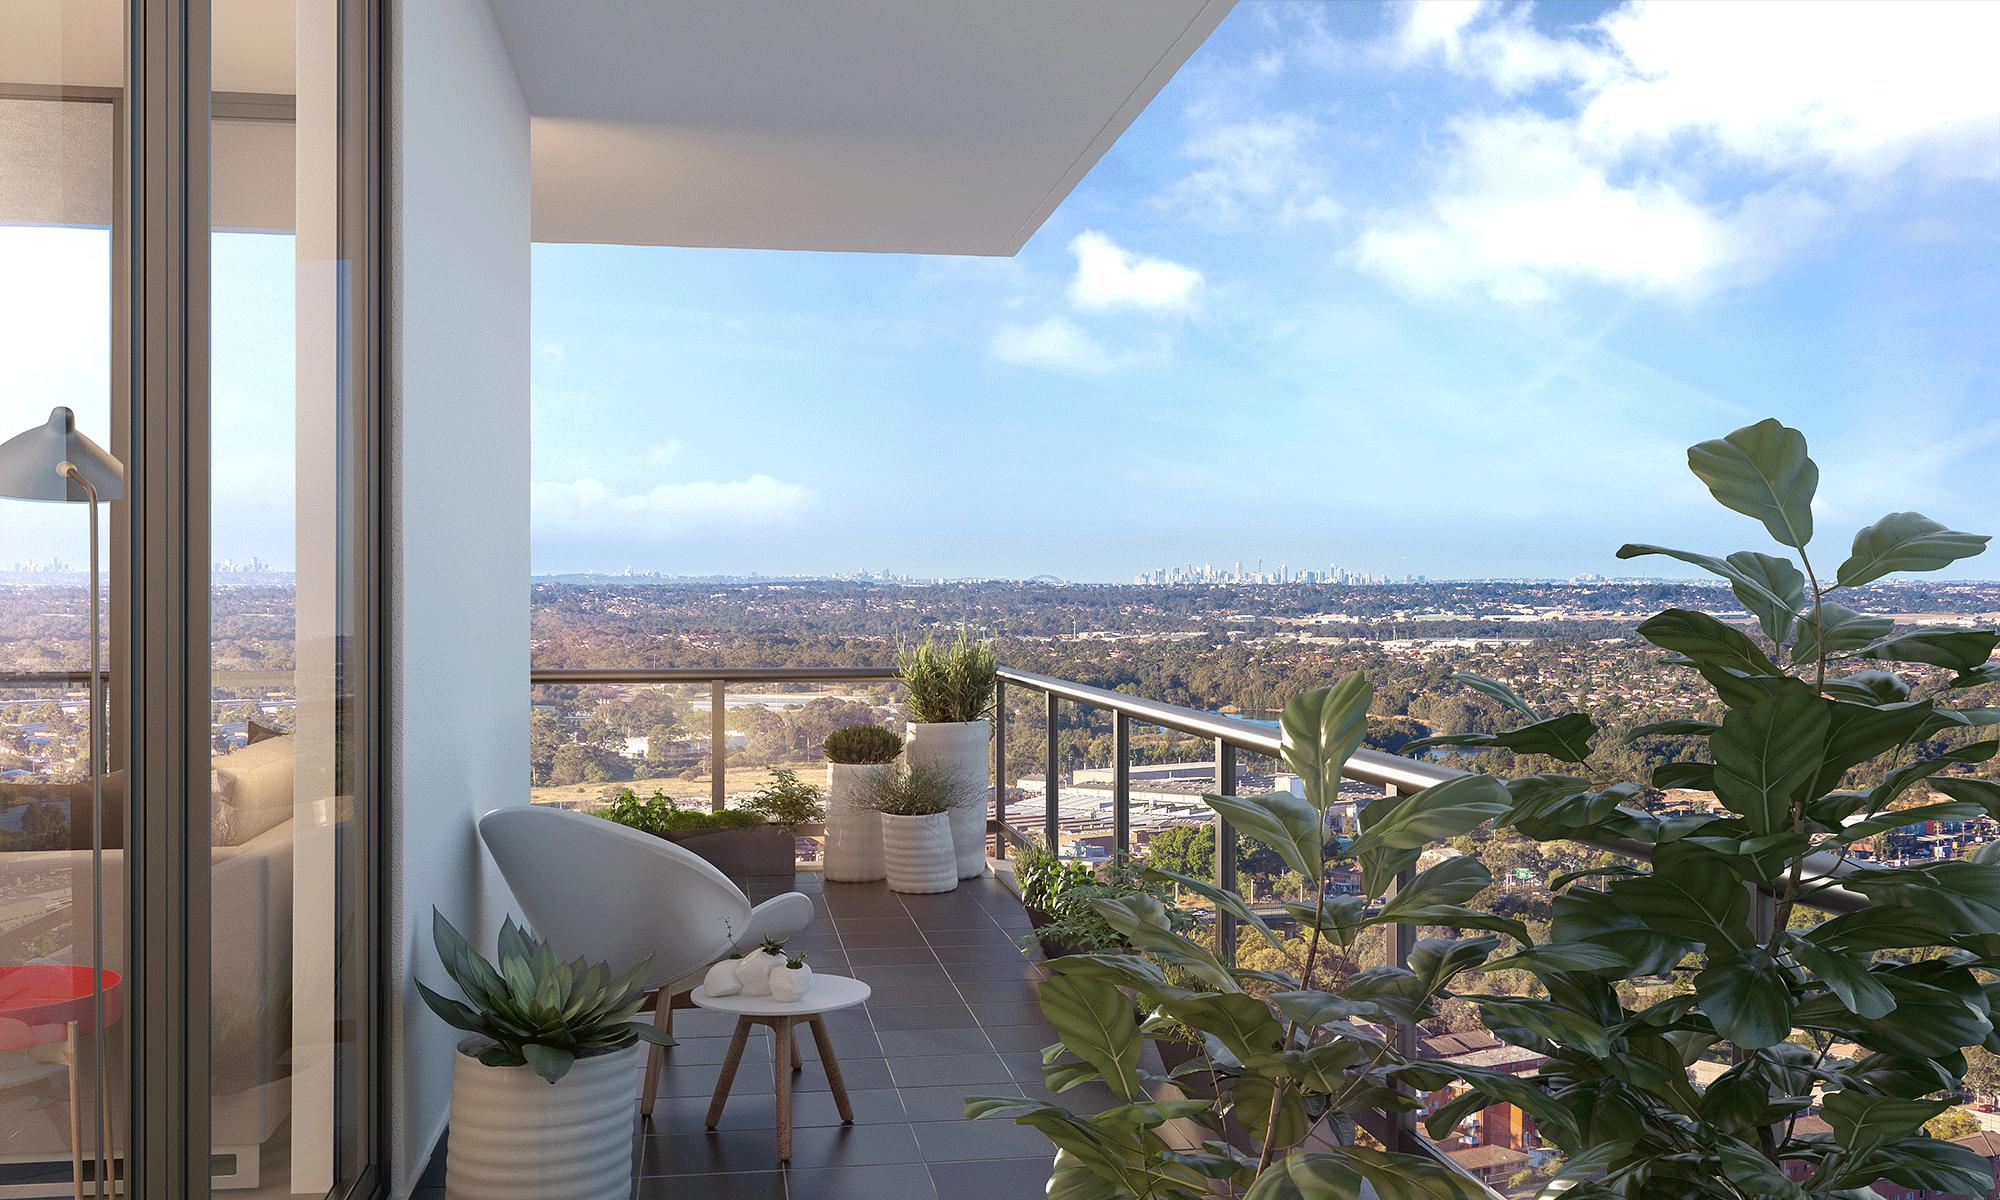 141028---Skyhaus---Level-28-Balcony---Final-2000.png